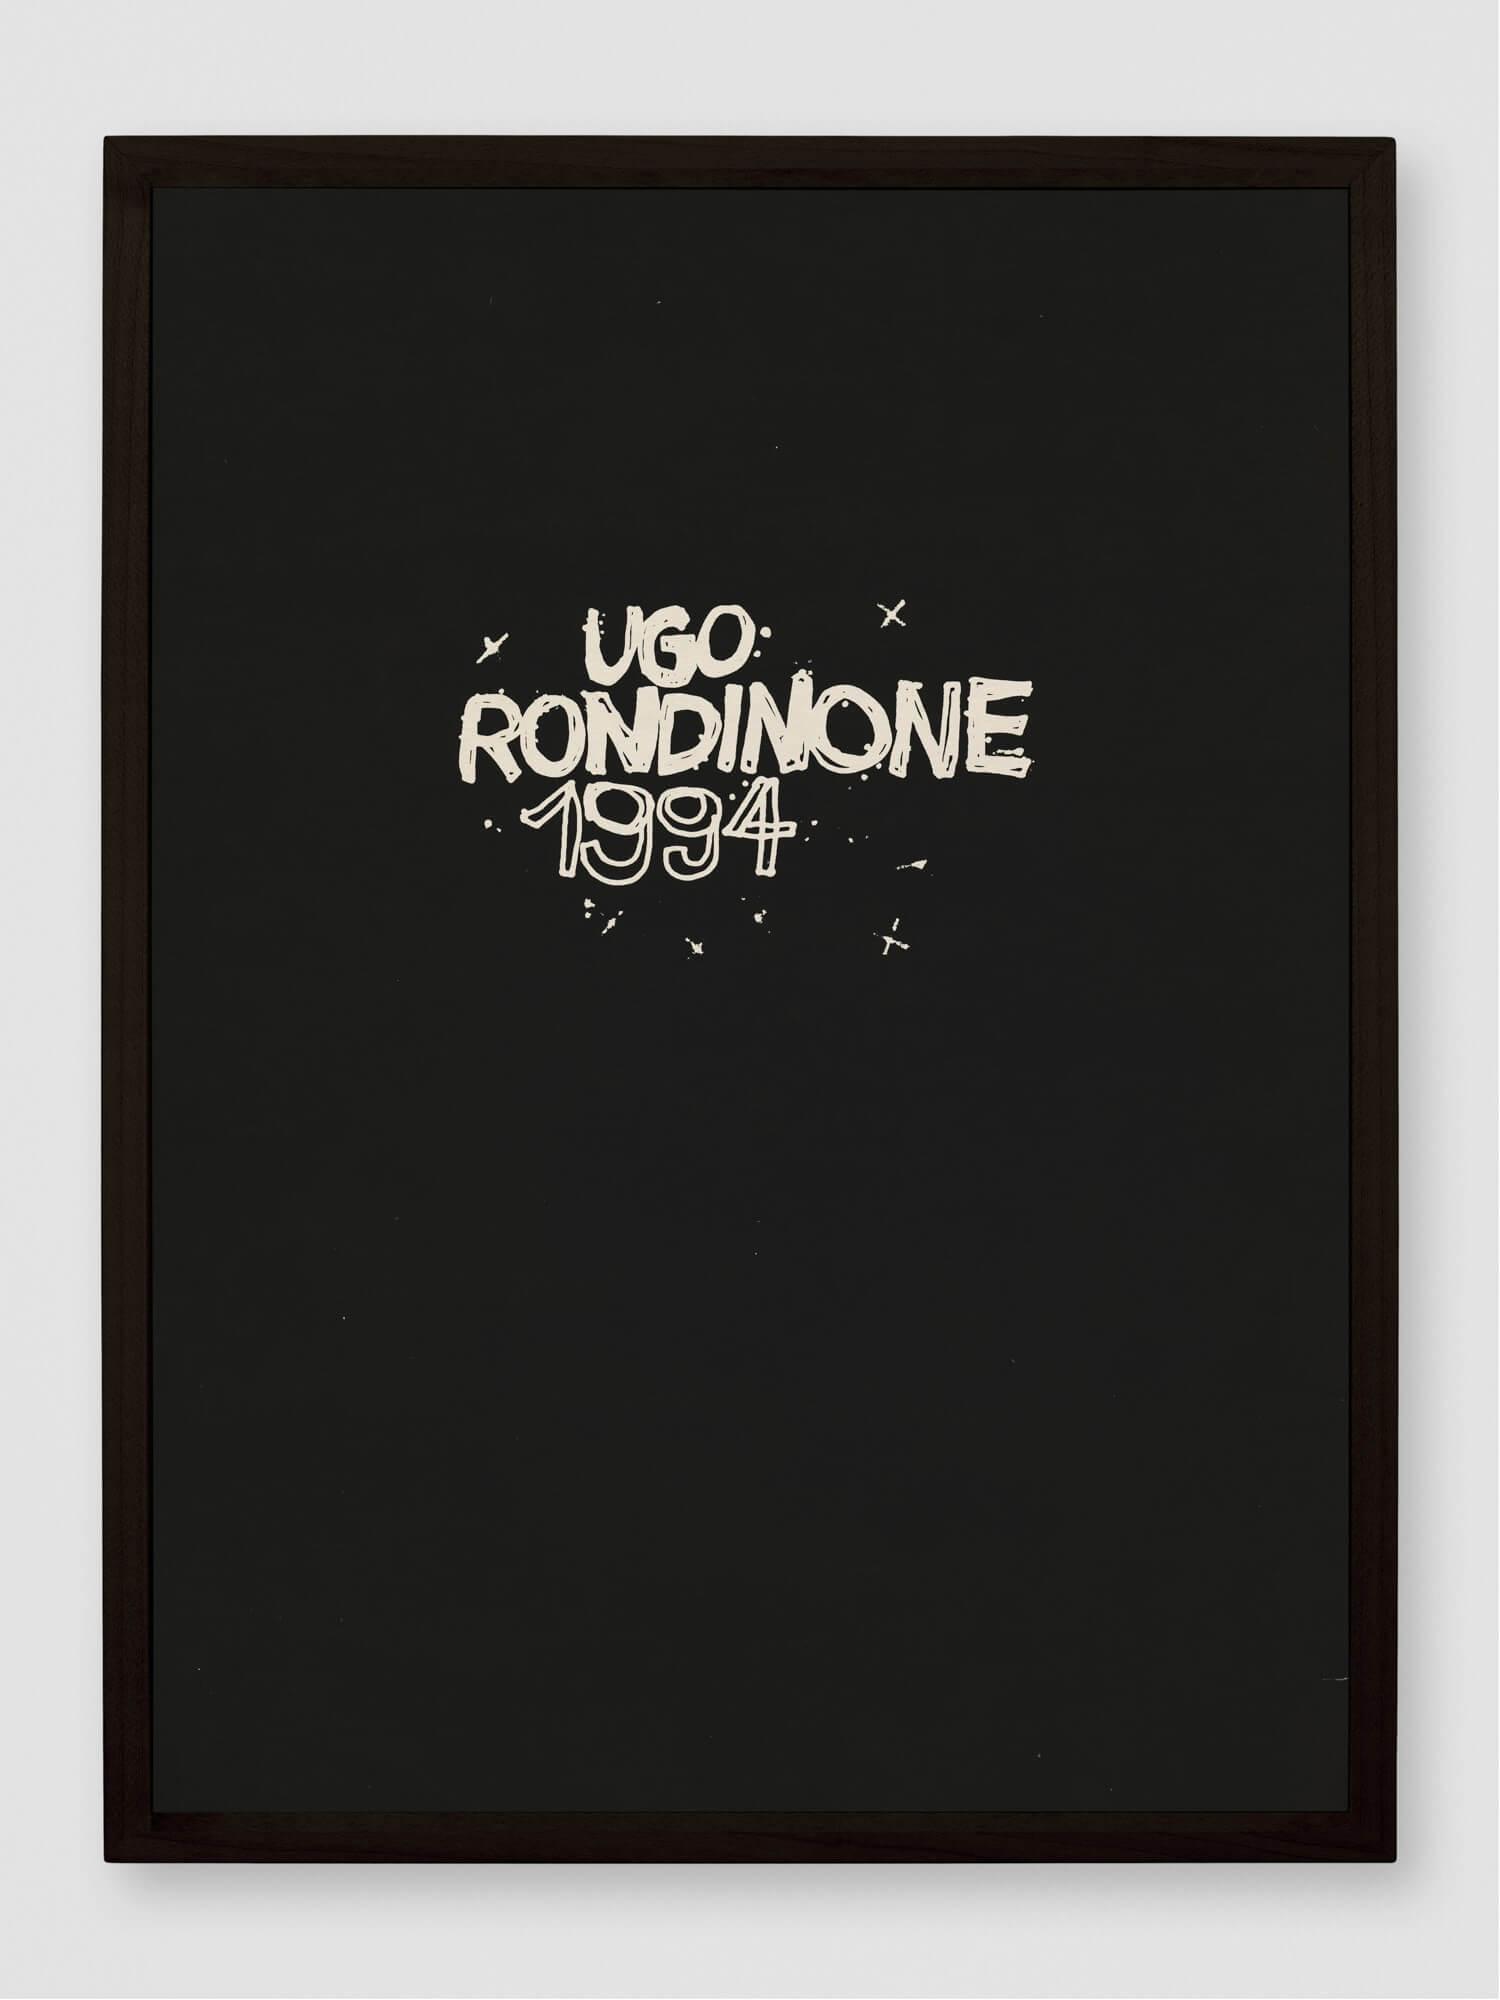 1994   UGO RONDINONE